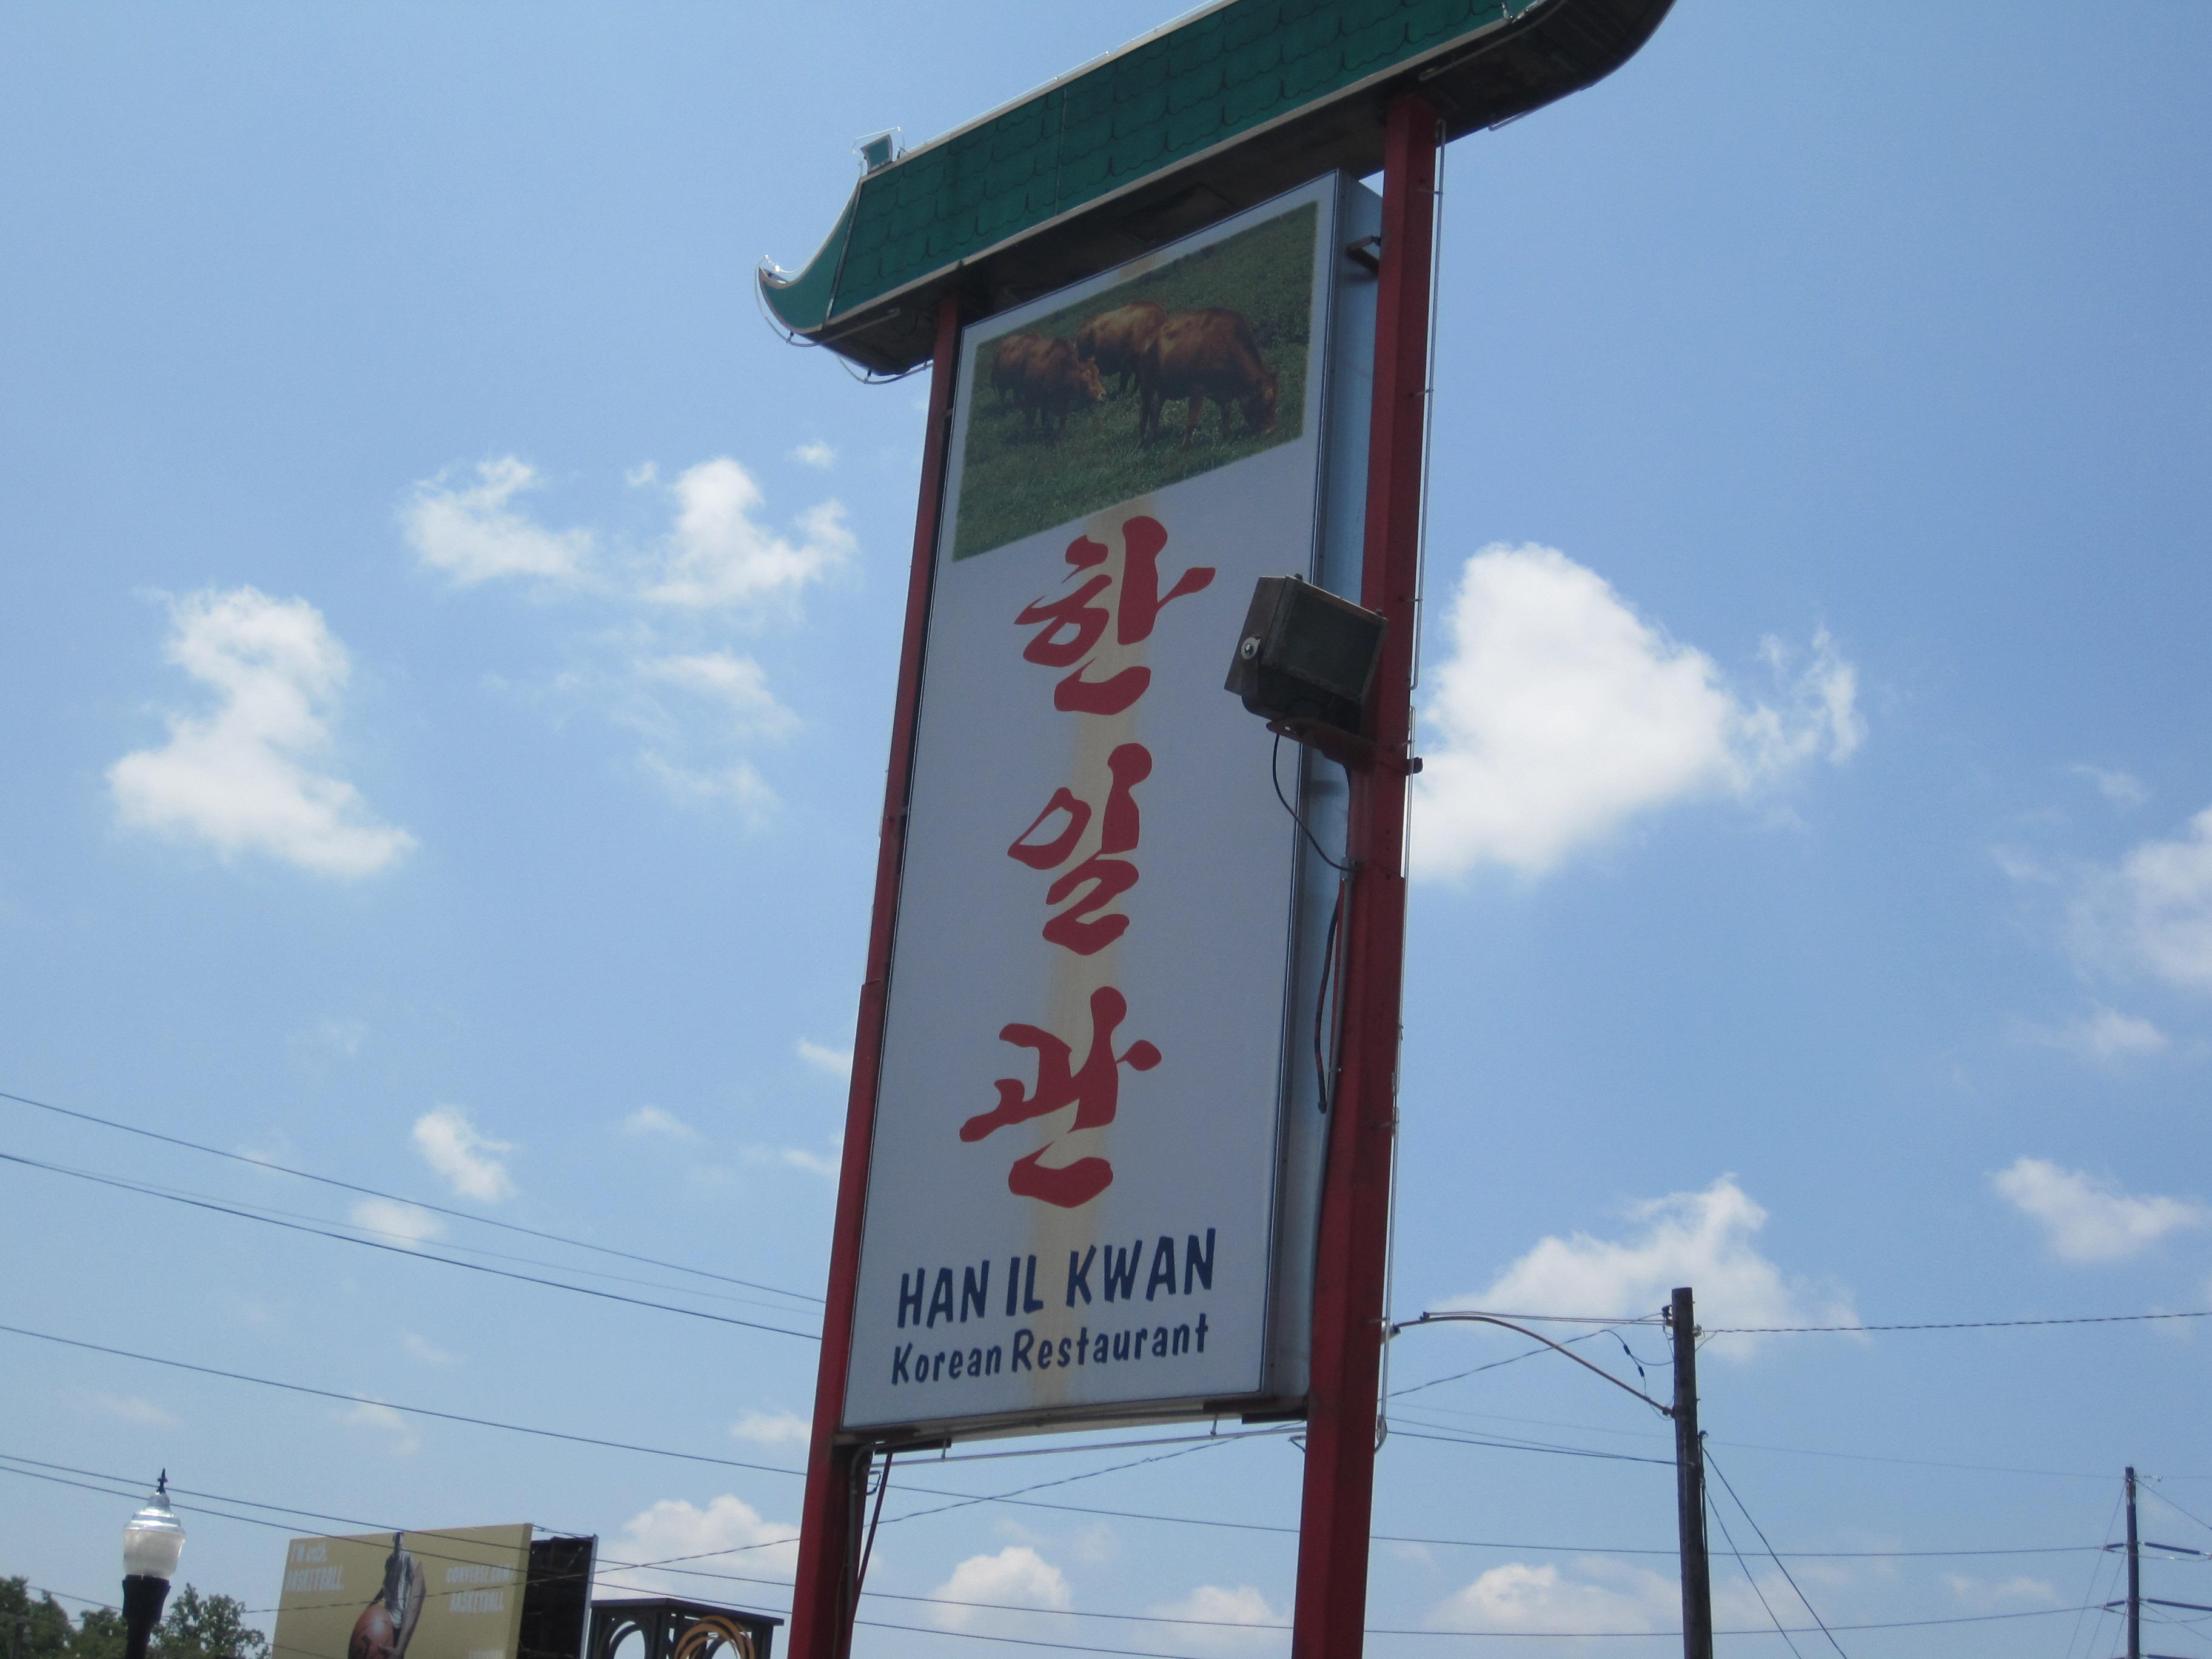 Korean   Food Near Snellville   Page 3